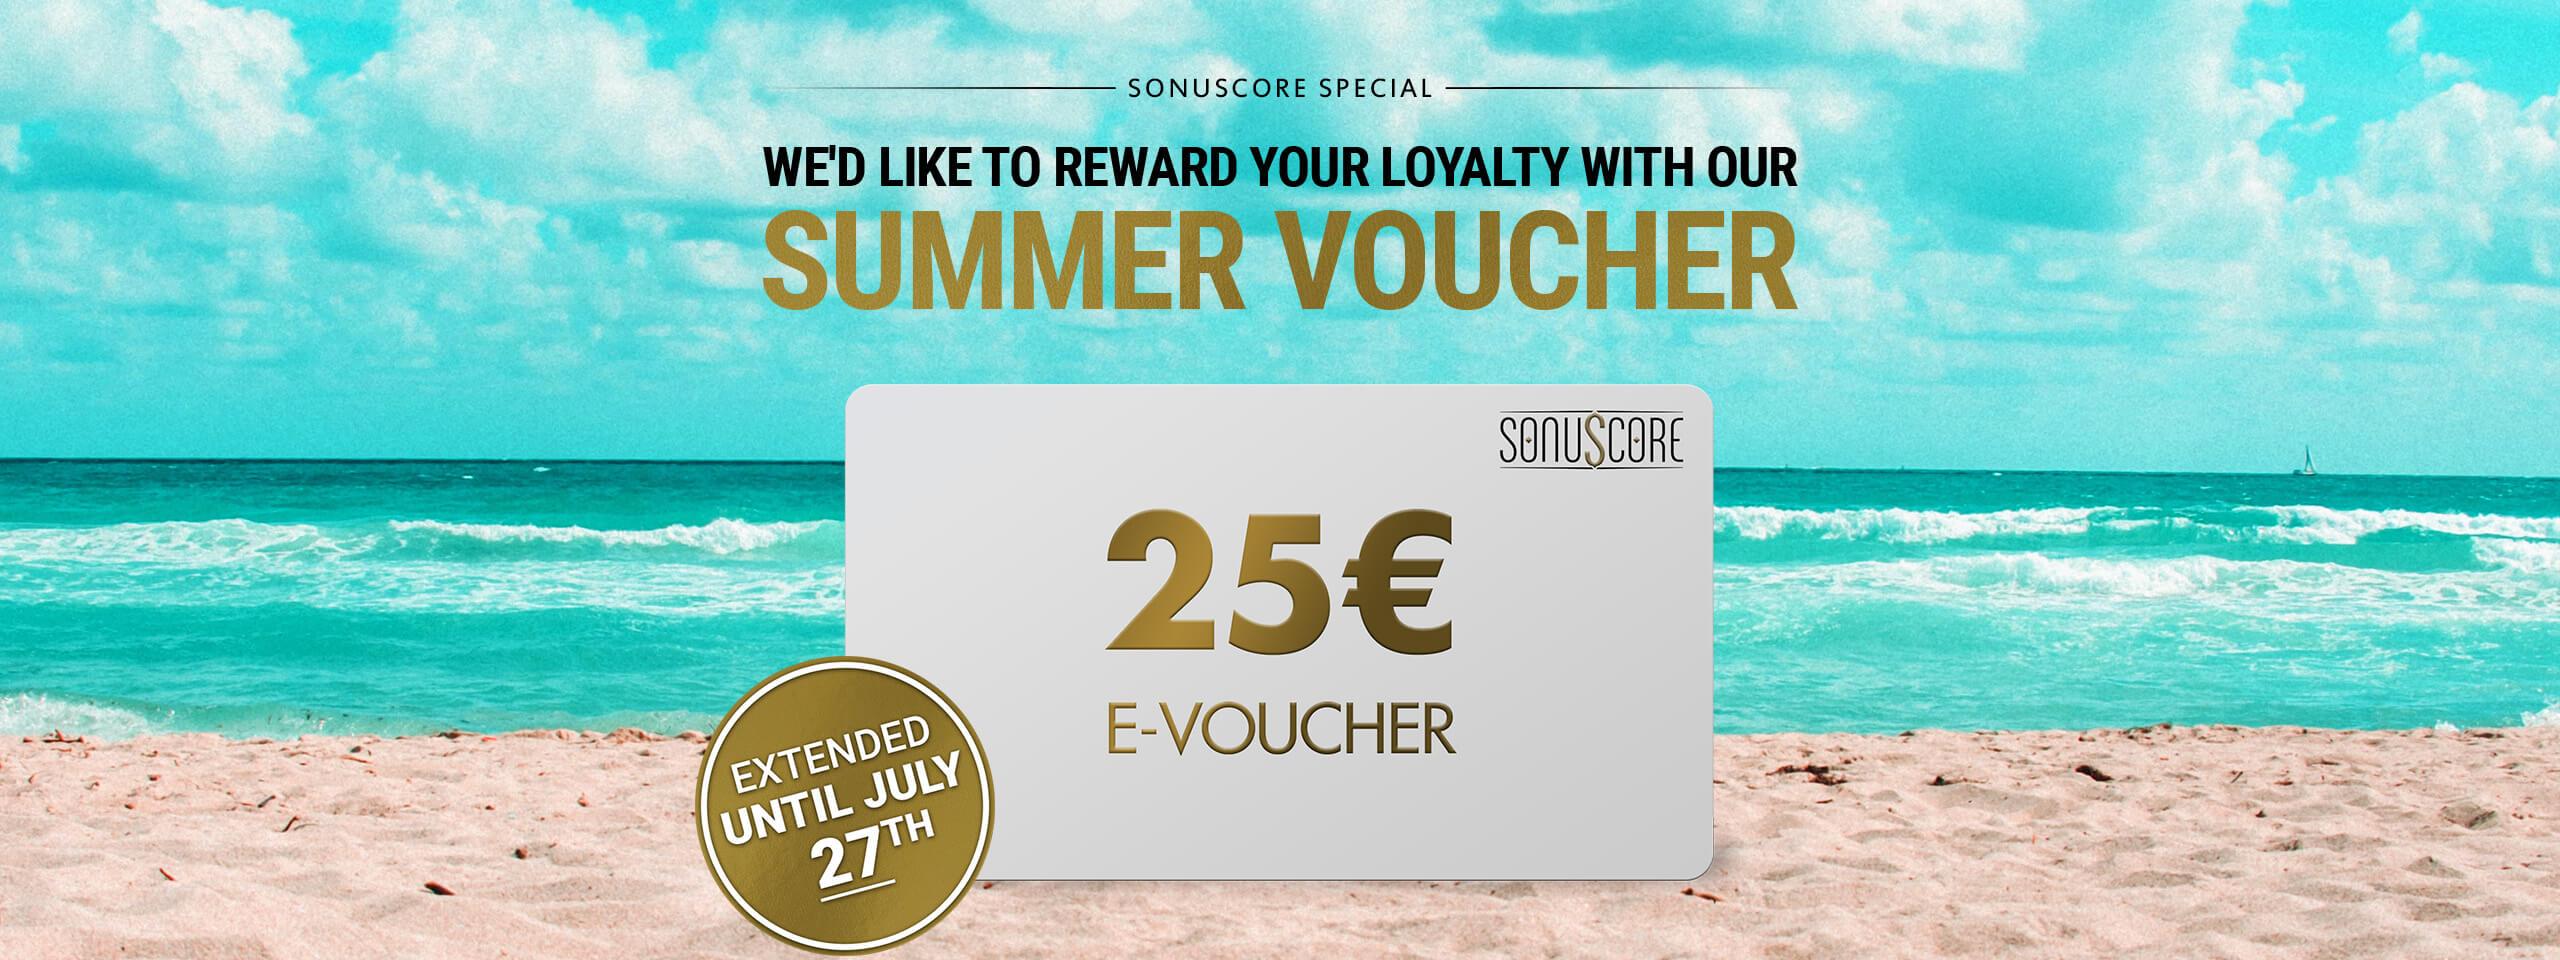 SONU 25Euro Summer Voucher Landingpage Slider Extended